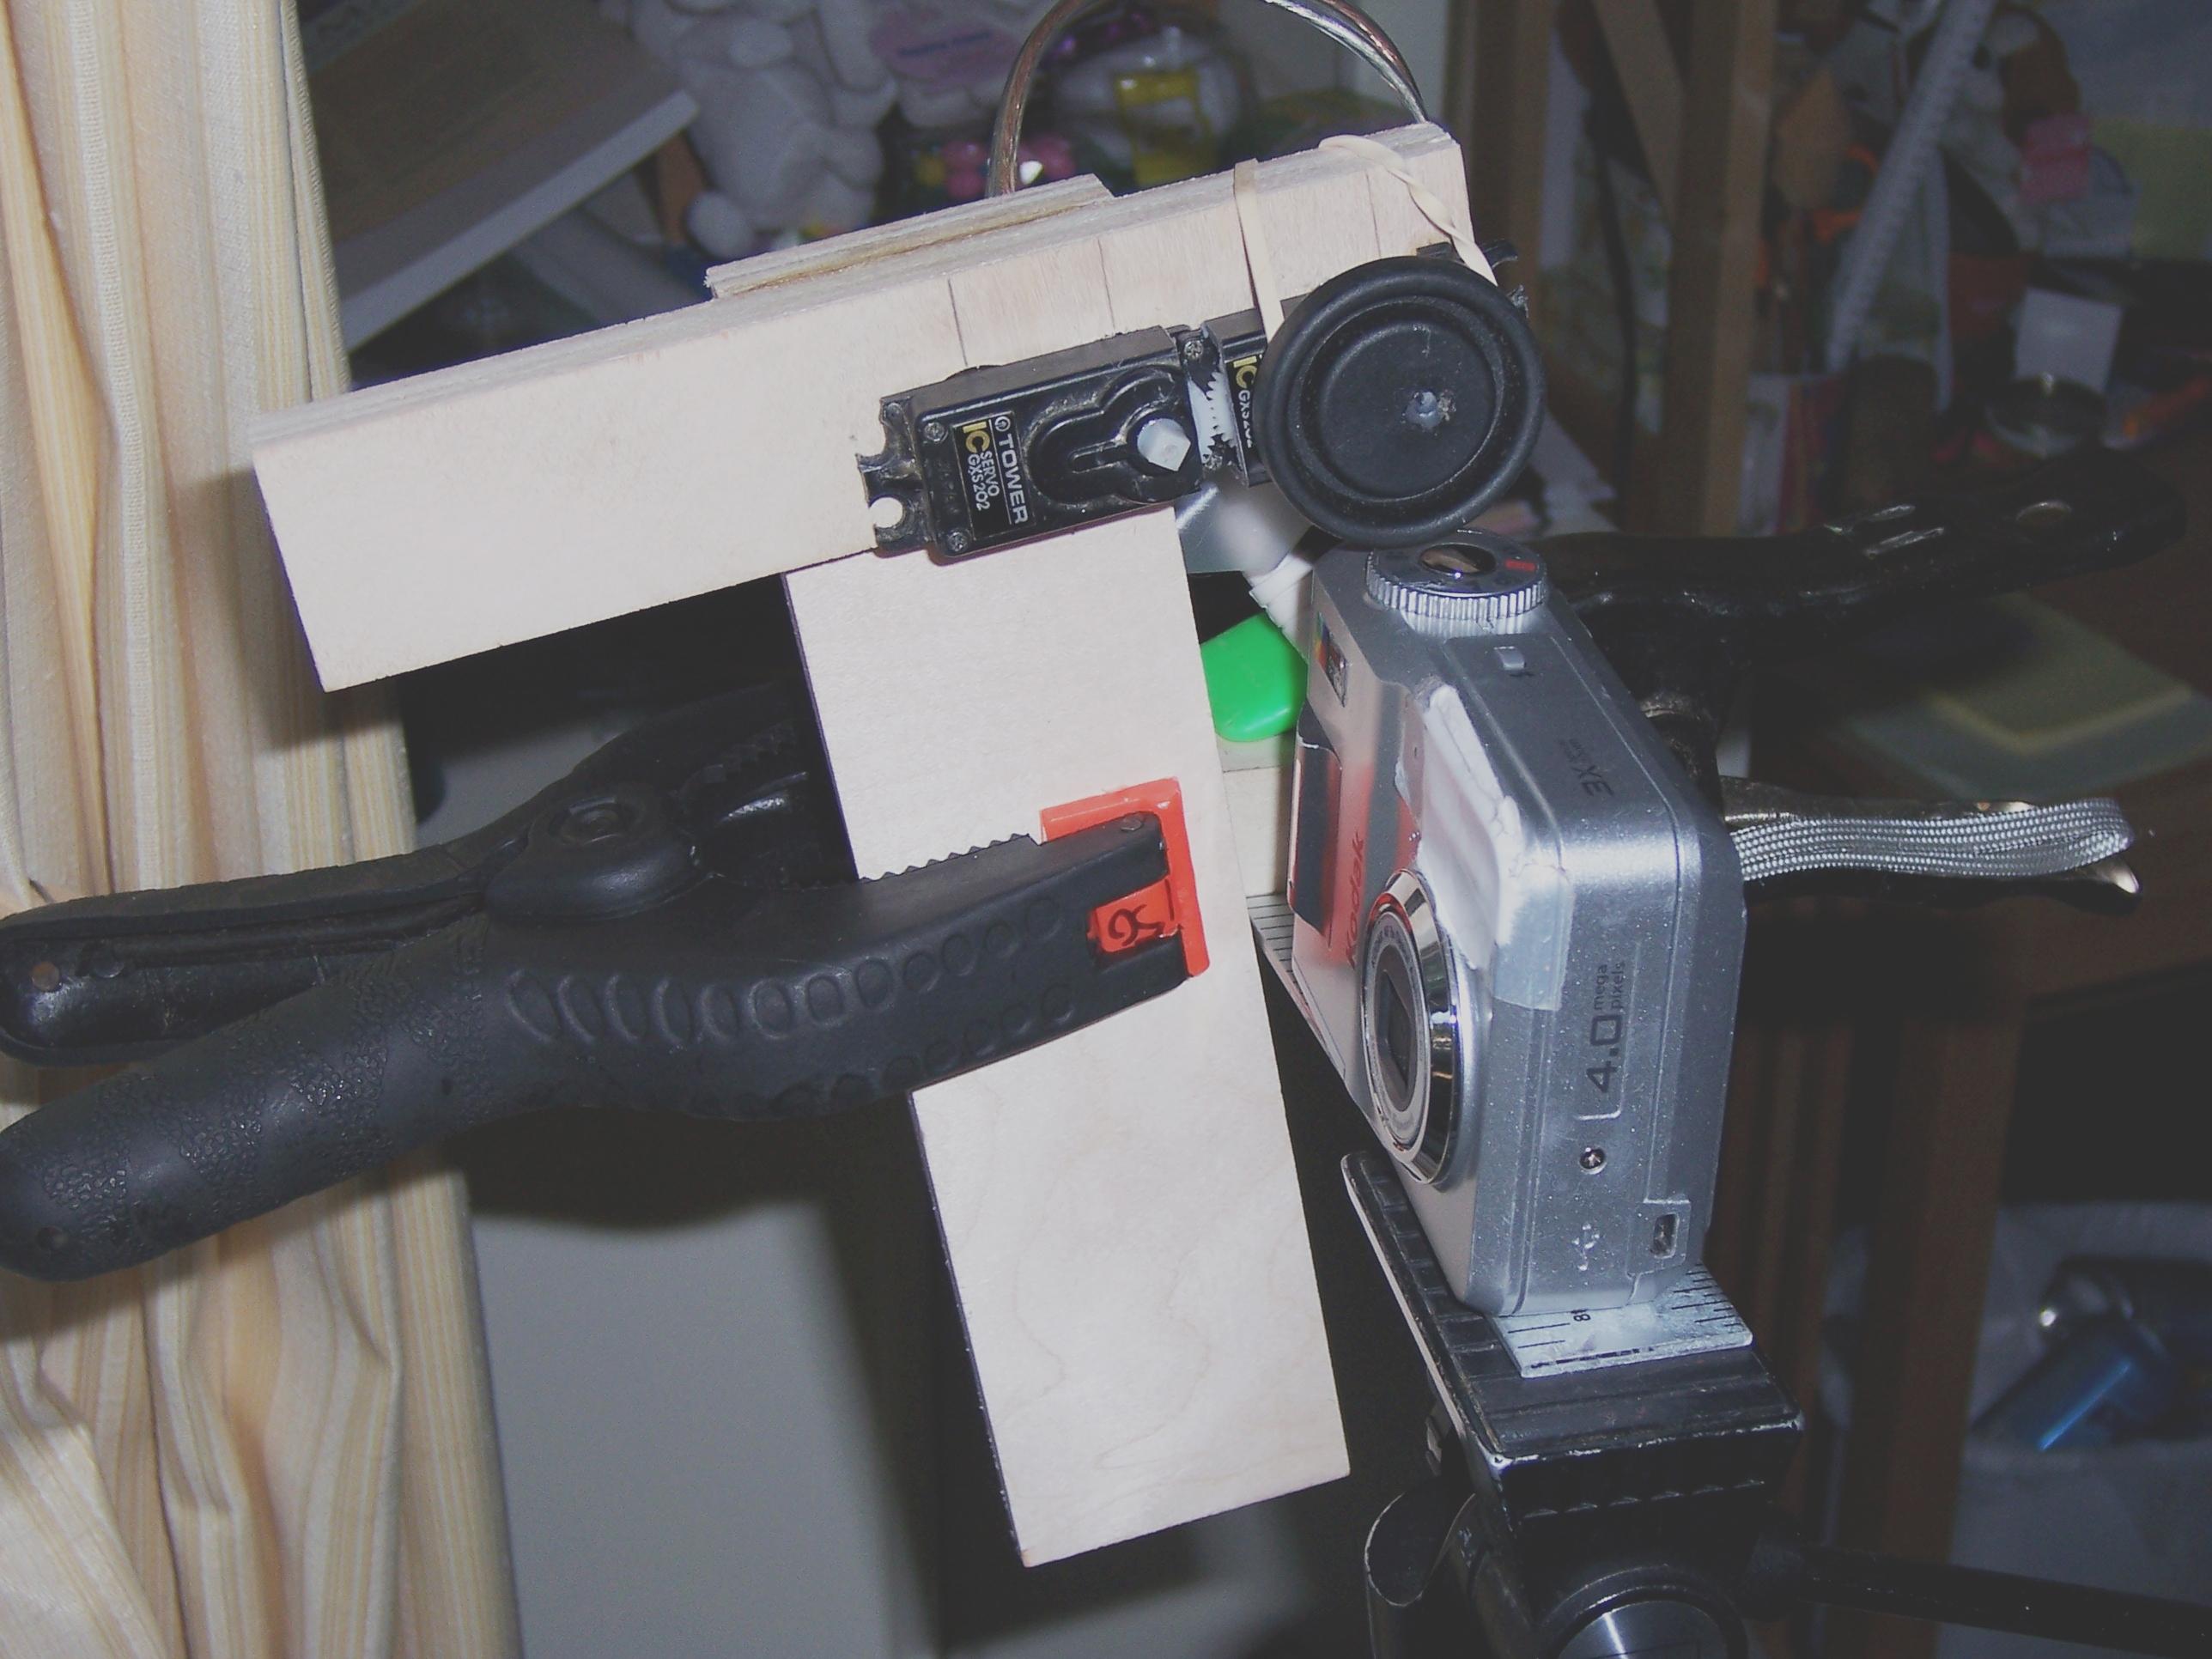 electromechanical time lapse trigger